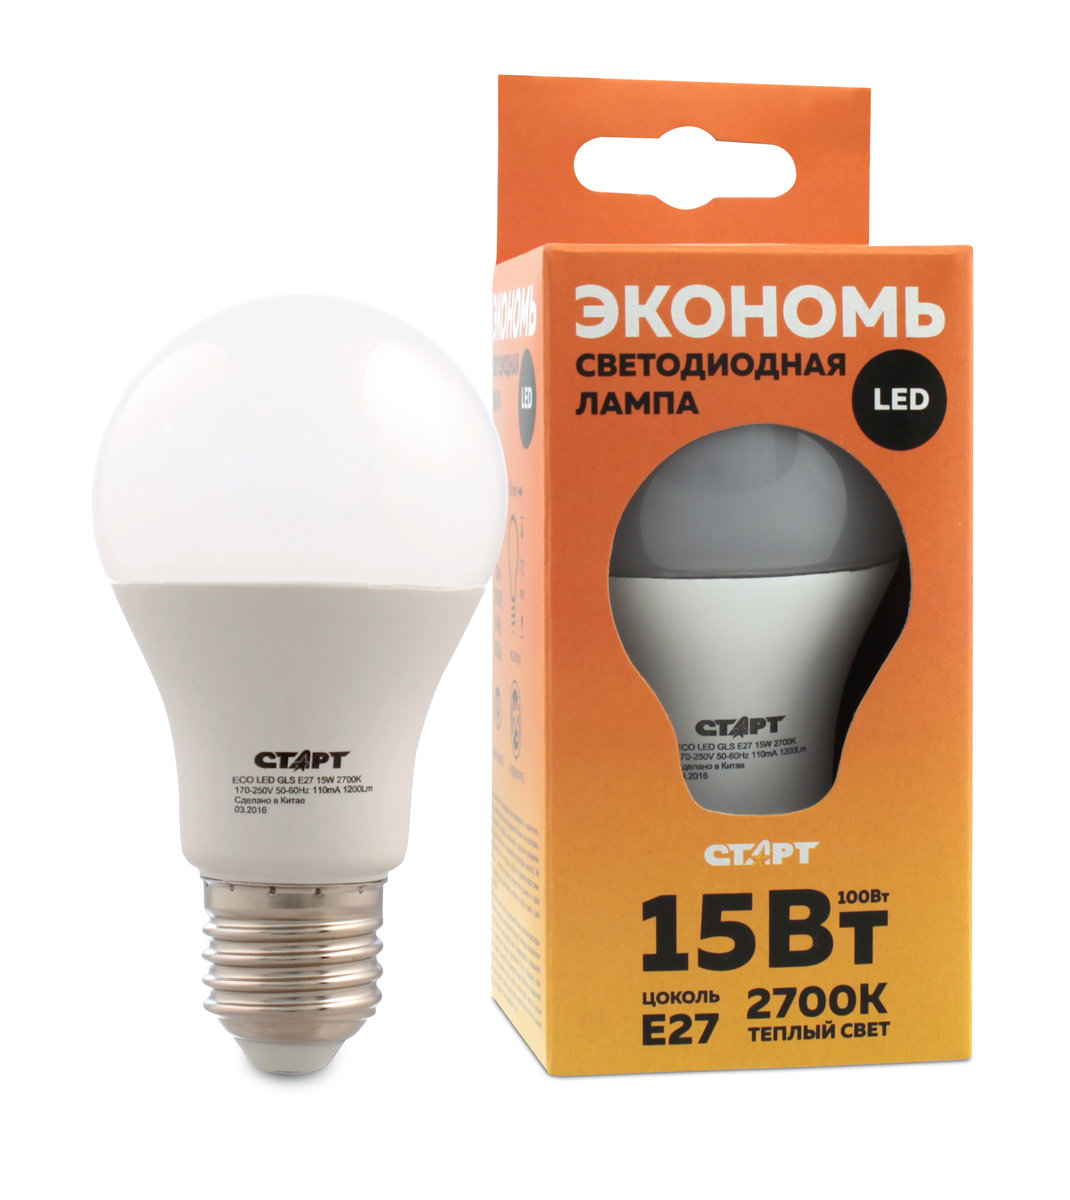 Лампа светодиодная СТАРТ, теплый свет, цоколь E27, 15W лампа светодиодная старт теплый свет цоколь e27 10w